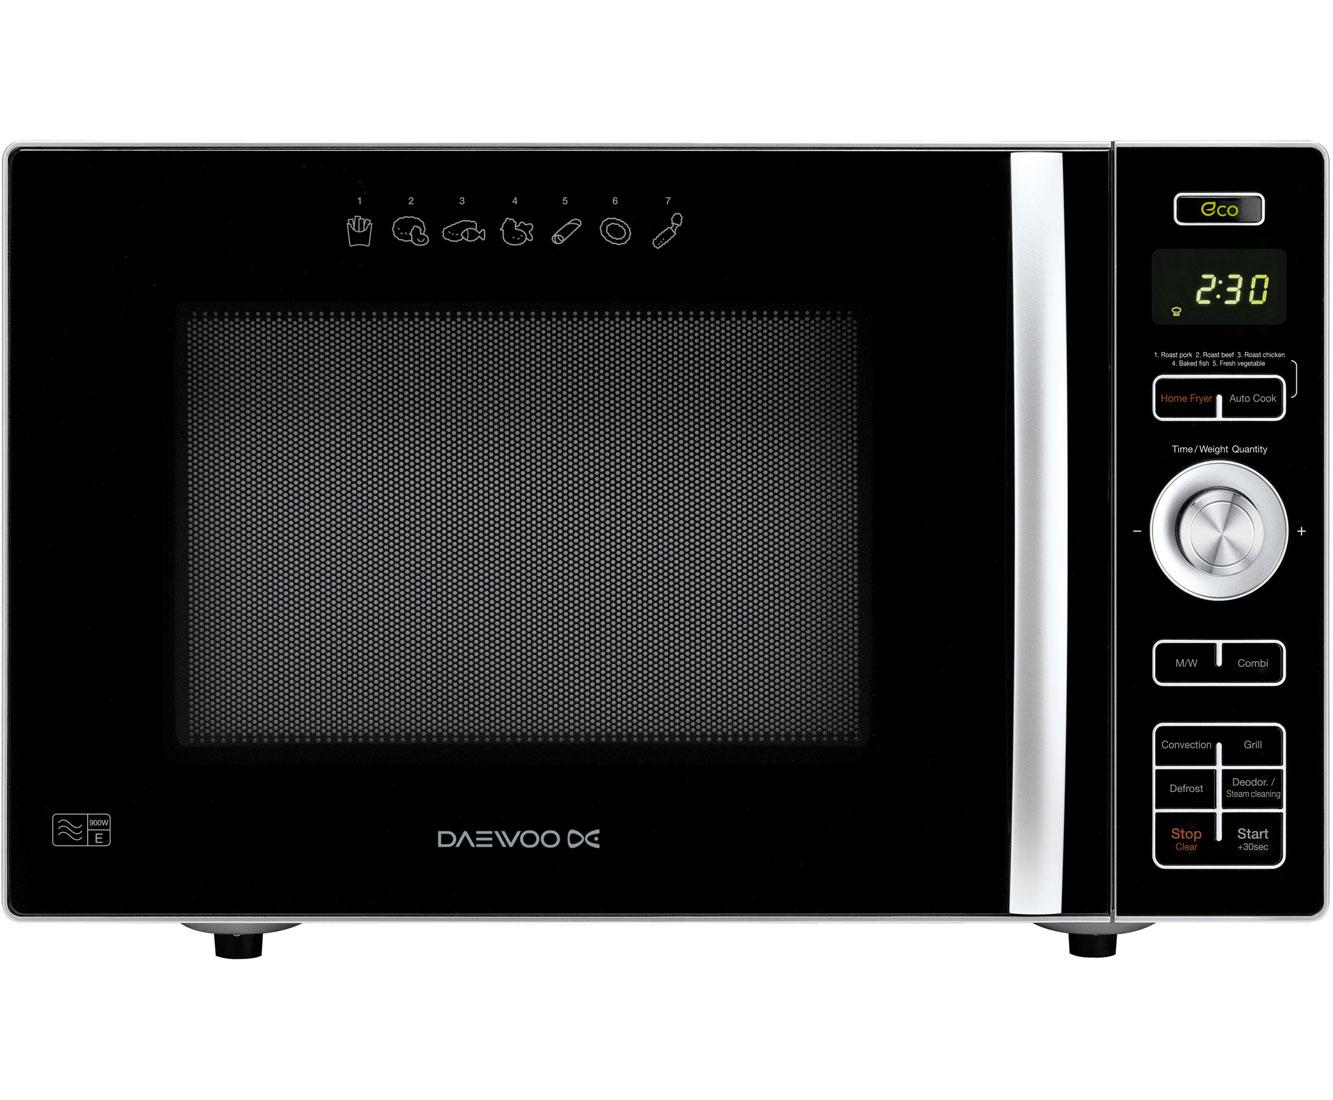 KOC8HAFR_BK | Daewoo Microwave | 24 Litre | ao.com